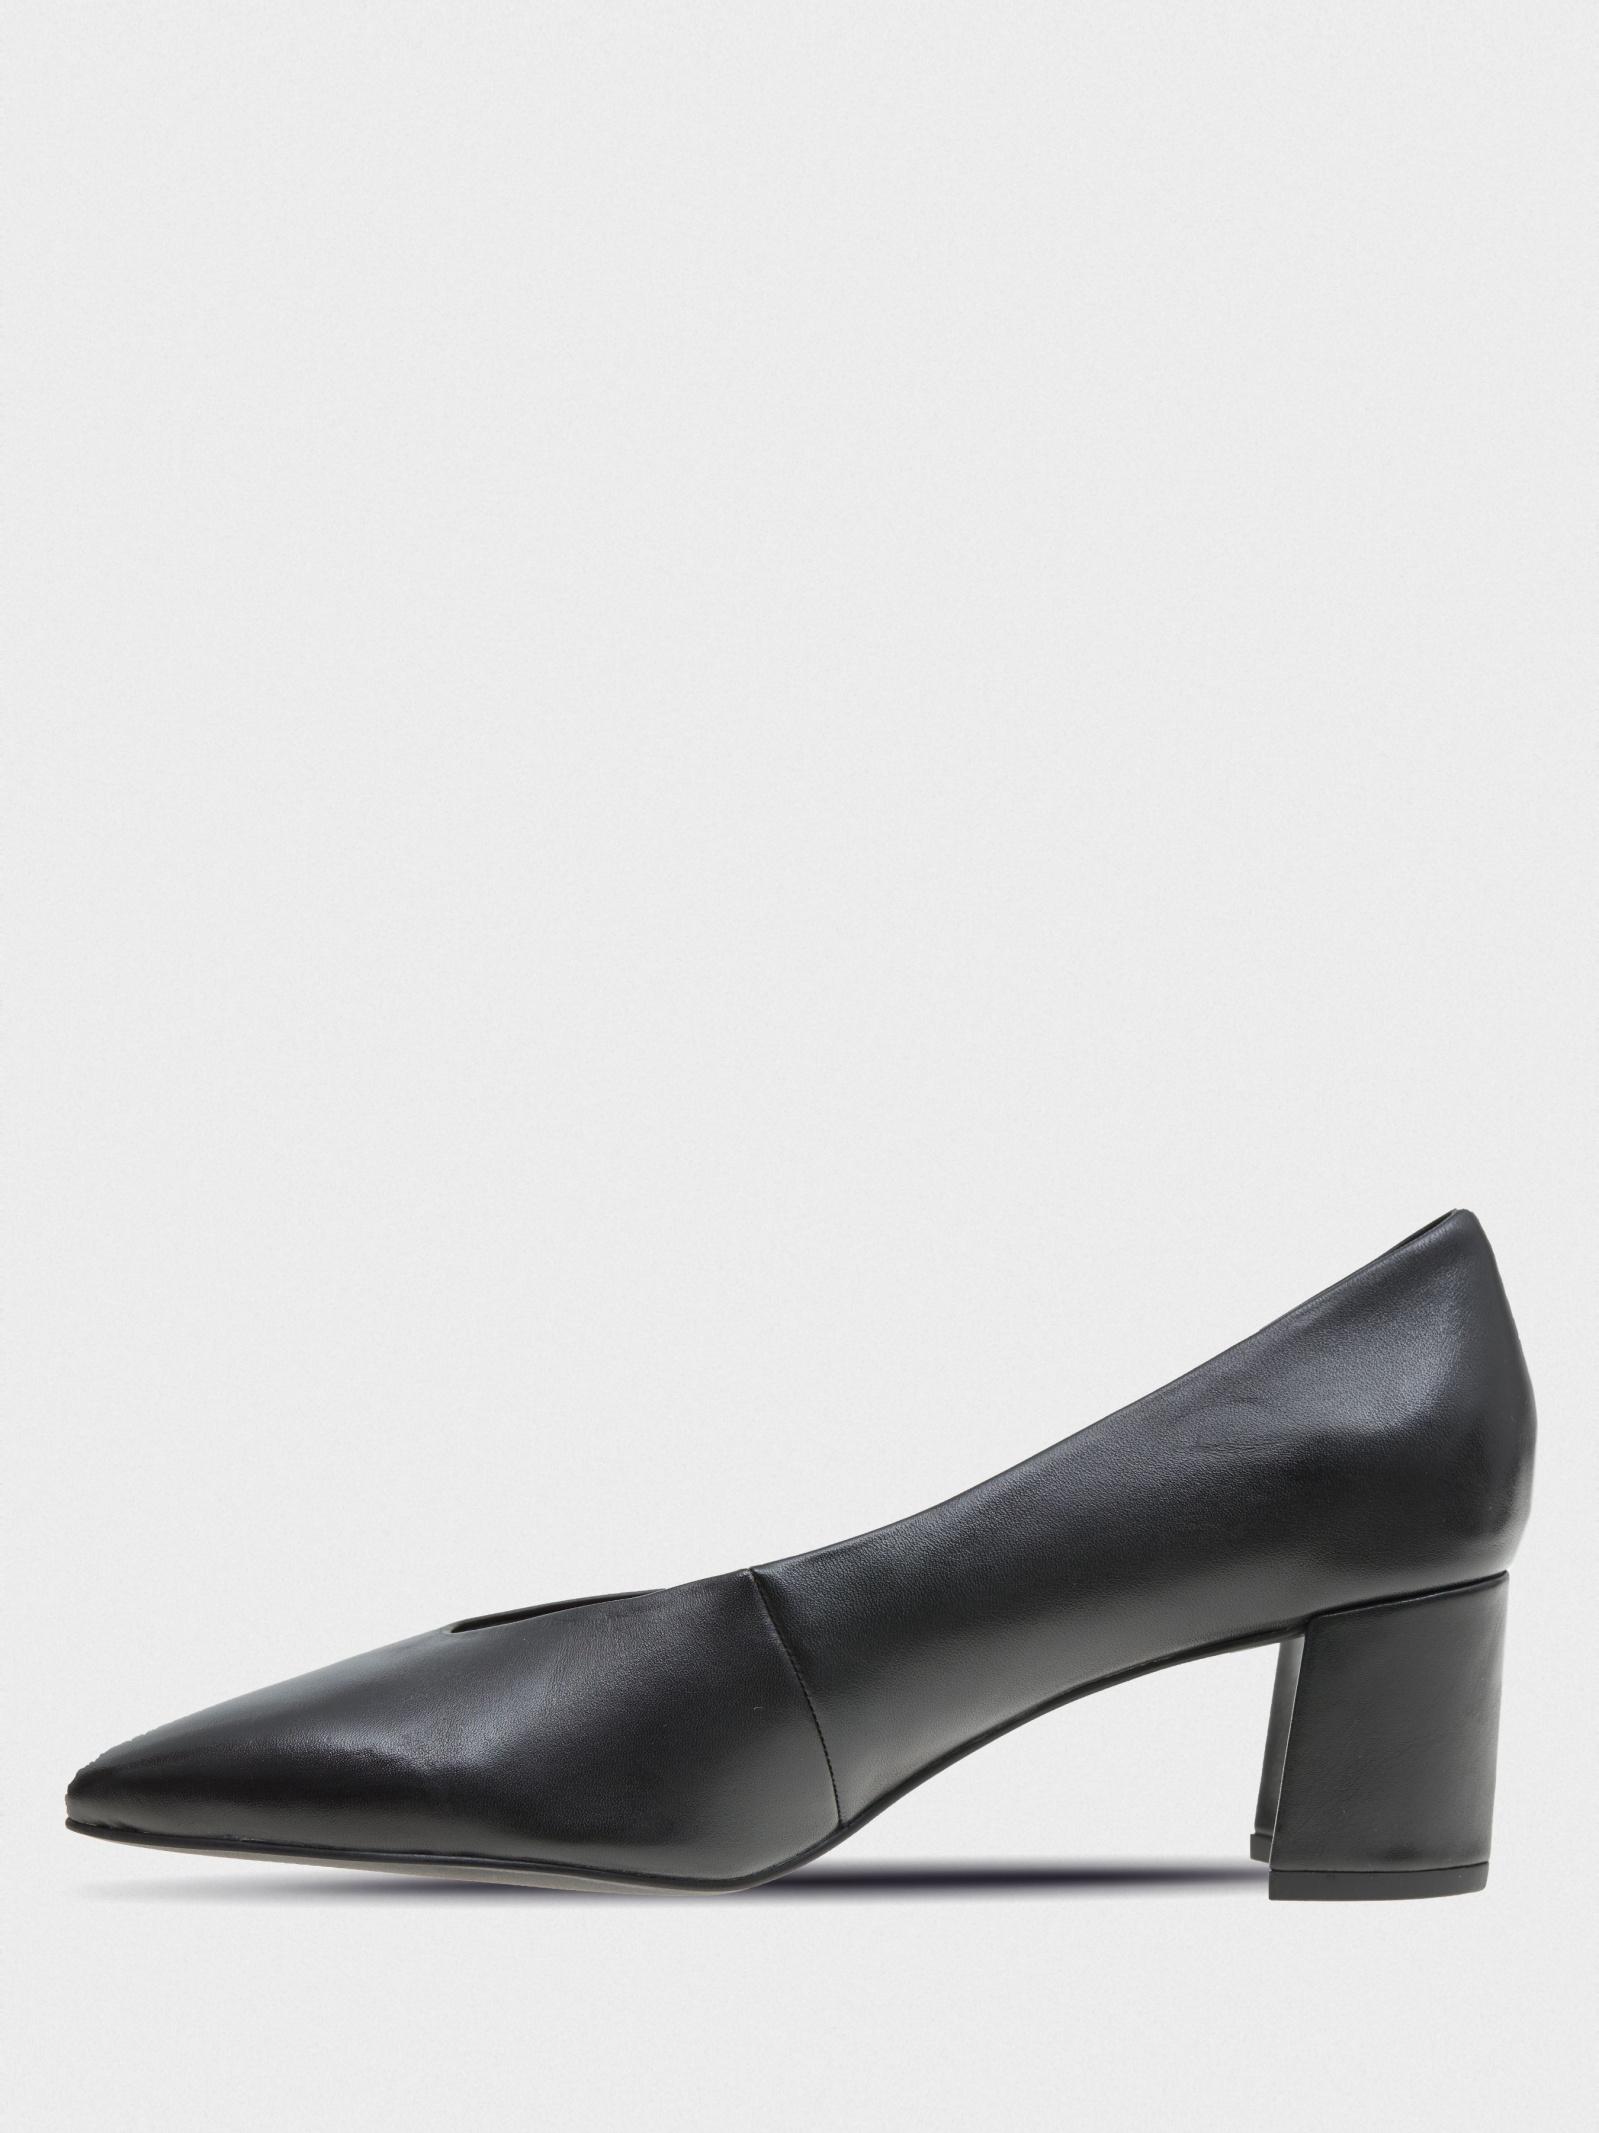 Туфли женские Marco Tozzi 3H310 брендовые, 2017